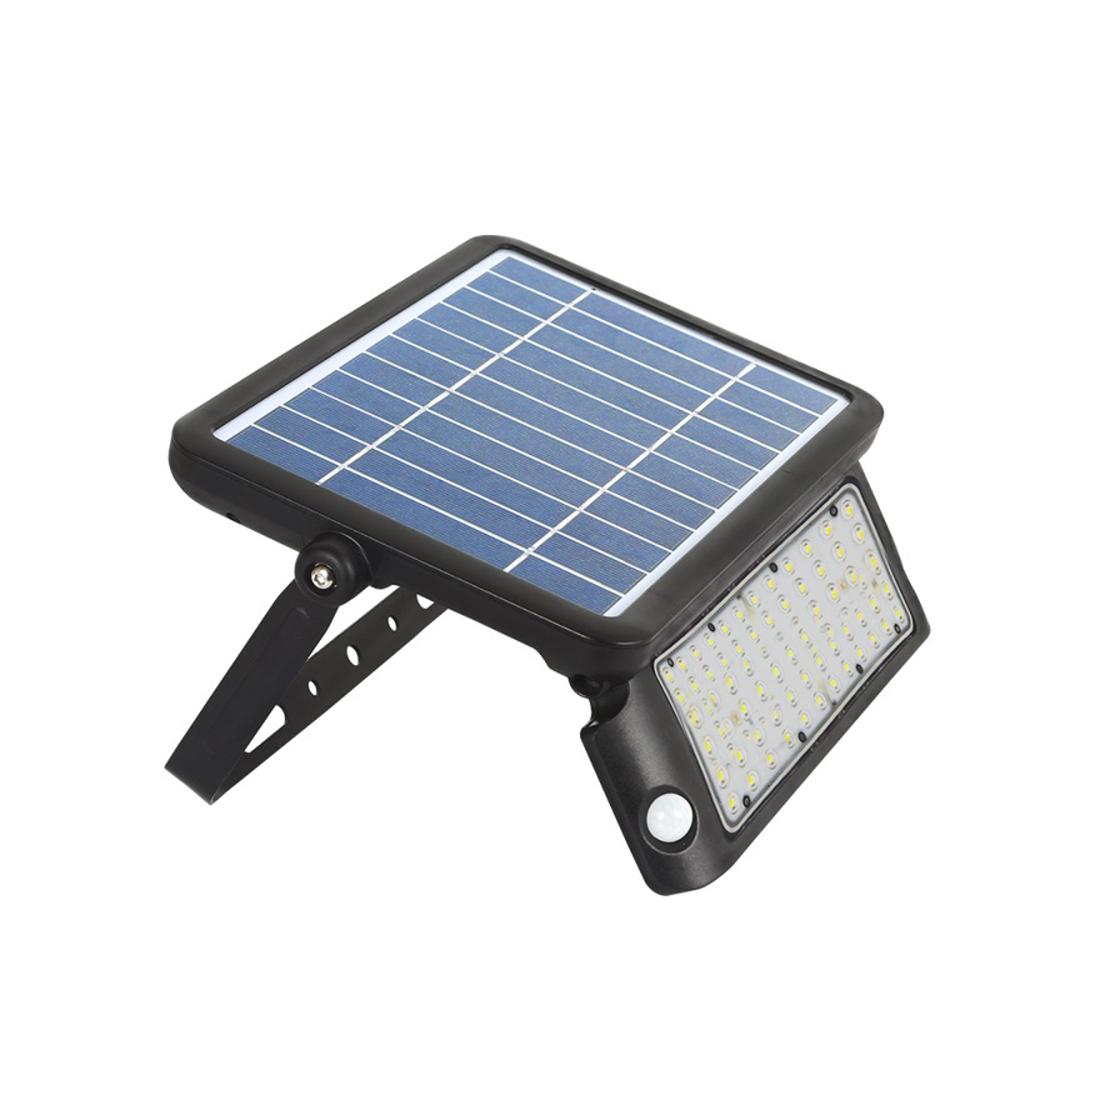 5W Led napelemes (solar) reflektor 4000K